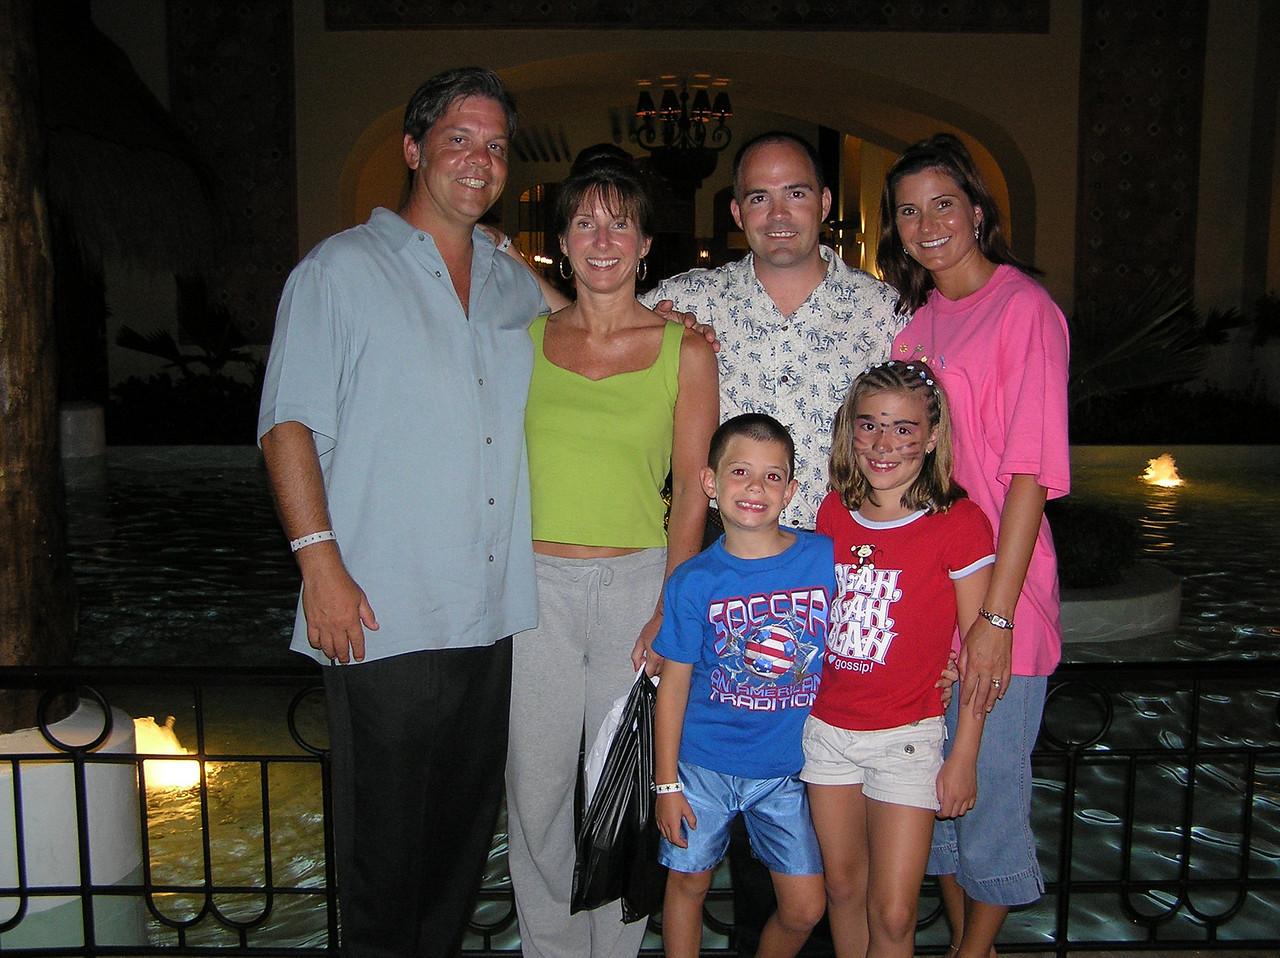 Our great traveling friends...Steve Pugh and Kim Bridgers.